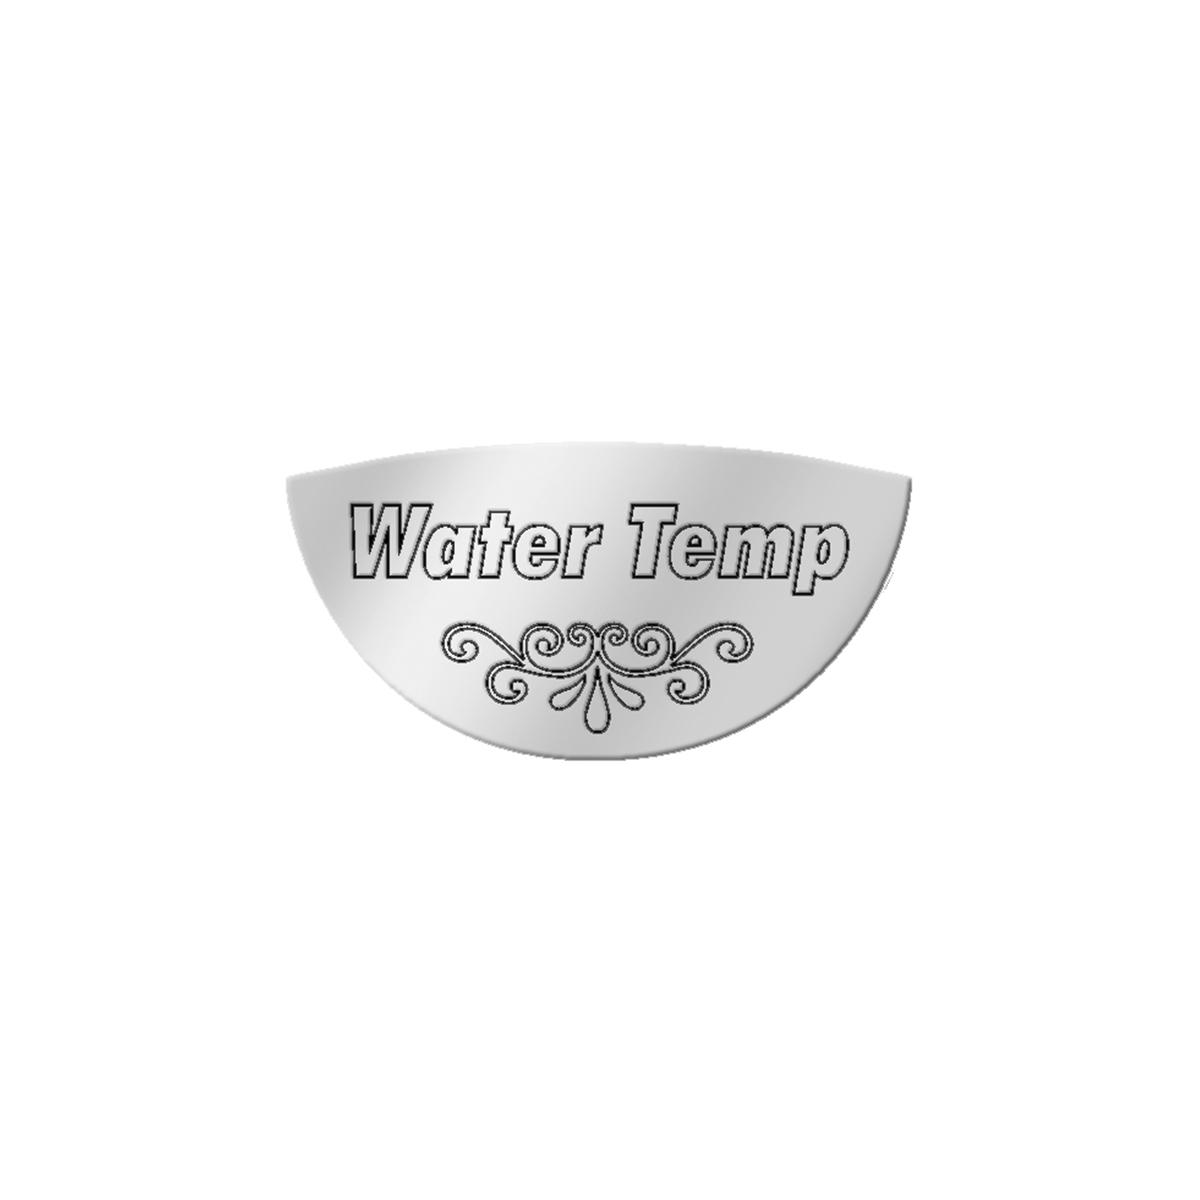 Grand General Stainless Steel Elliptical Emblem Accent for Peterbilt